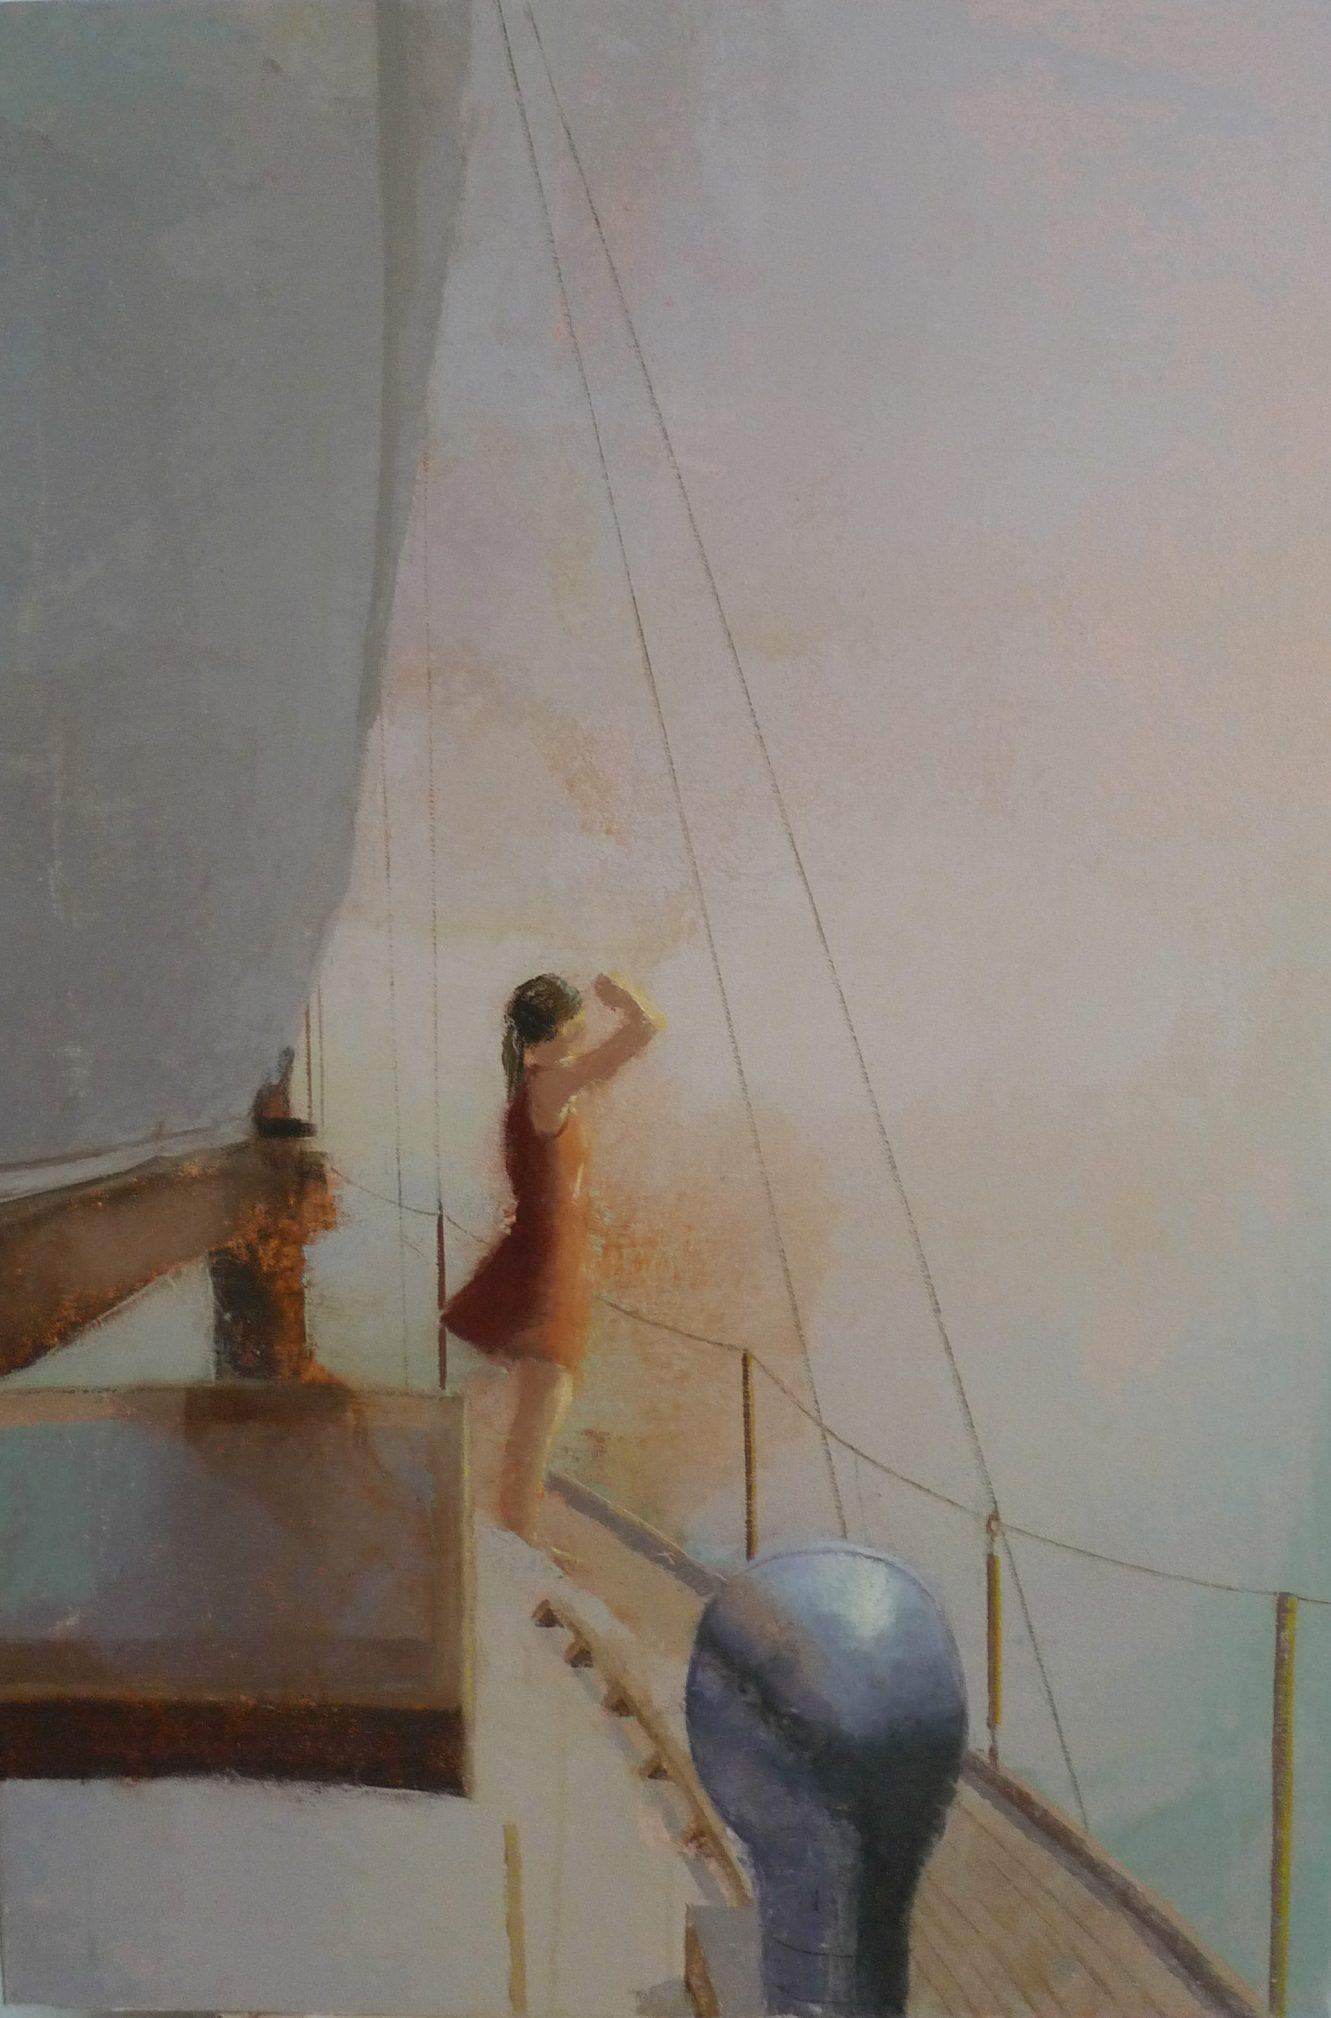 mist-alejandra-caballero-oleo-barco-mar-mujer-horizonte-niebla